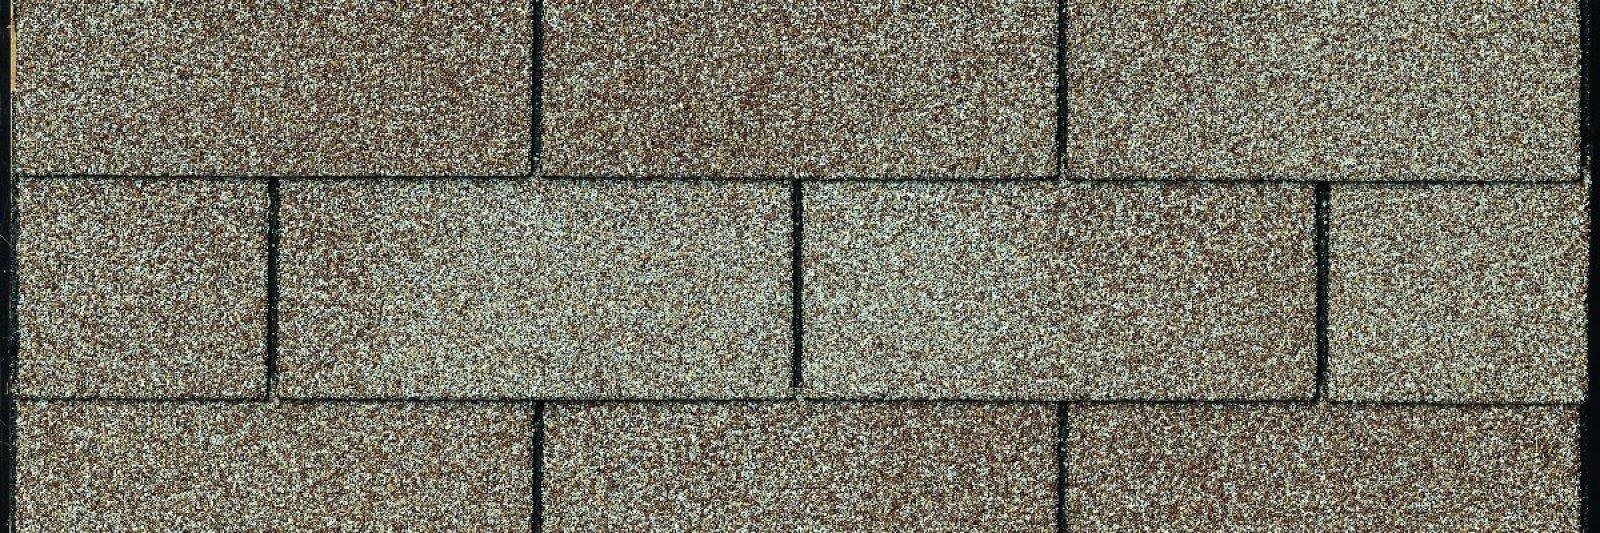 Cinnamon Frost image